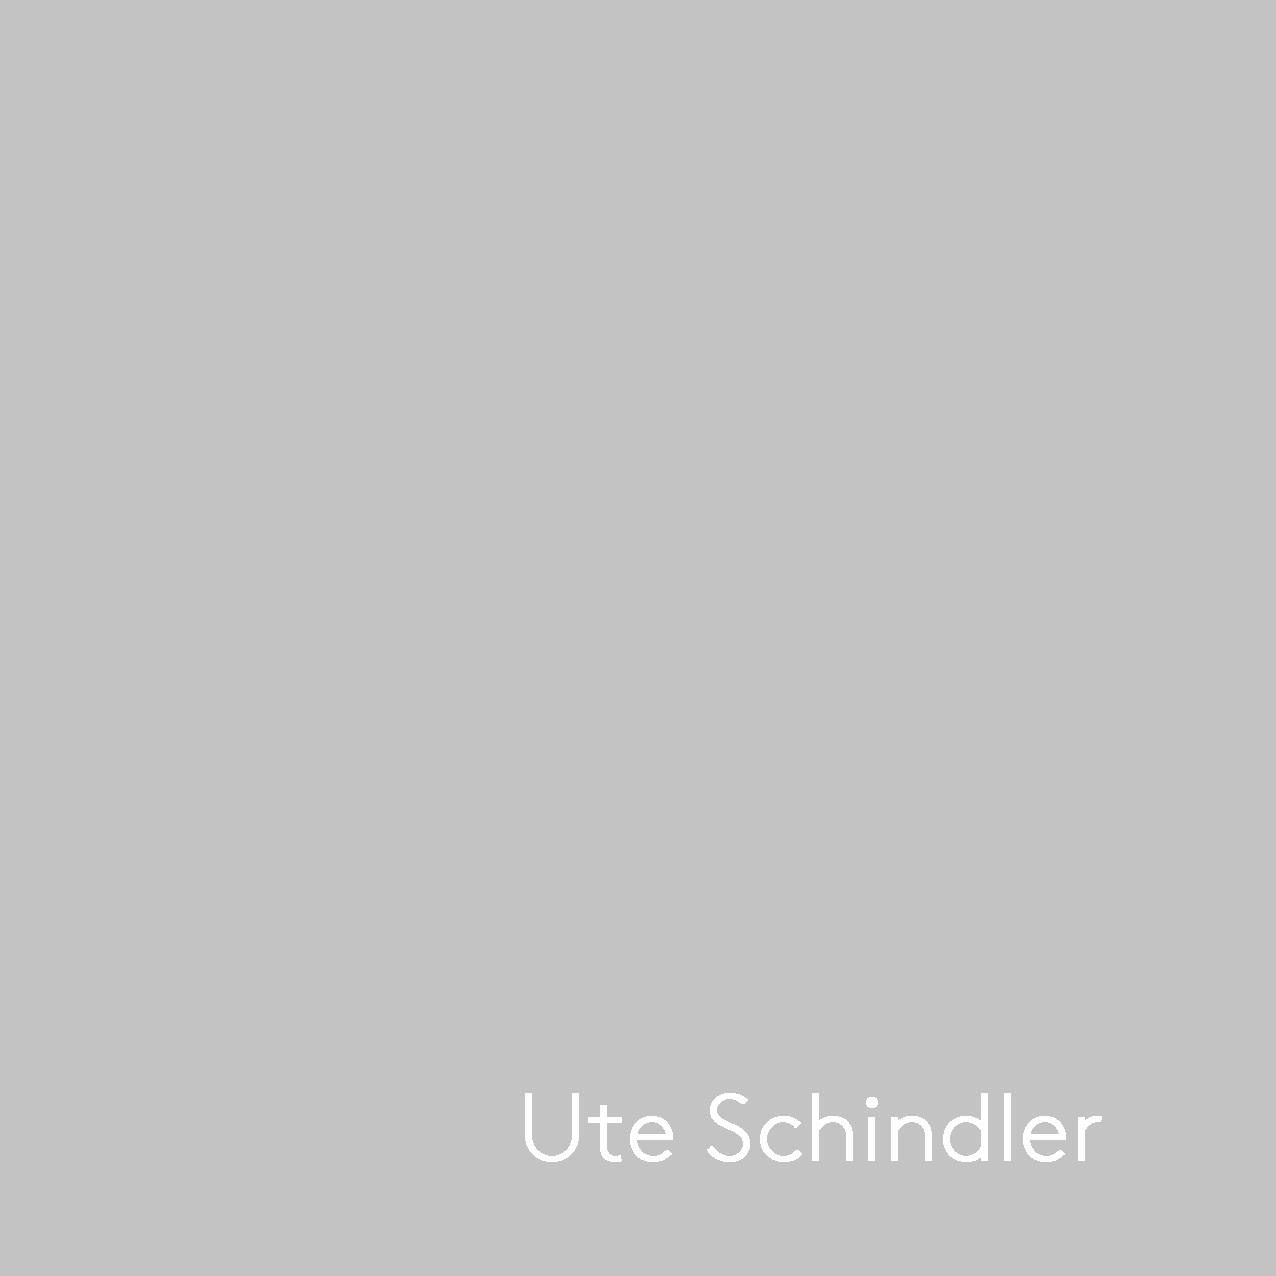 Ute Schindler